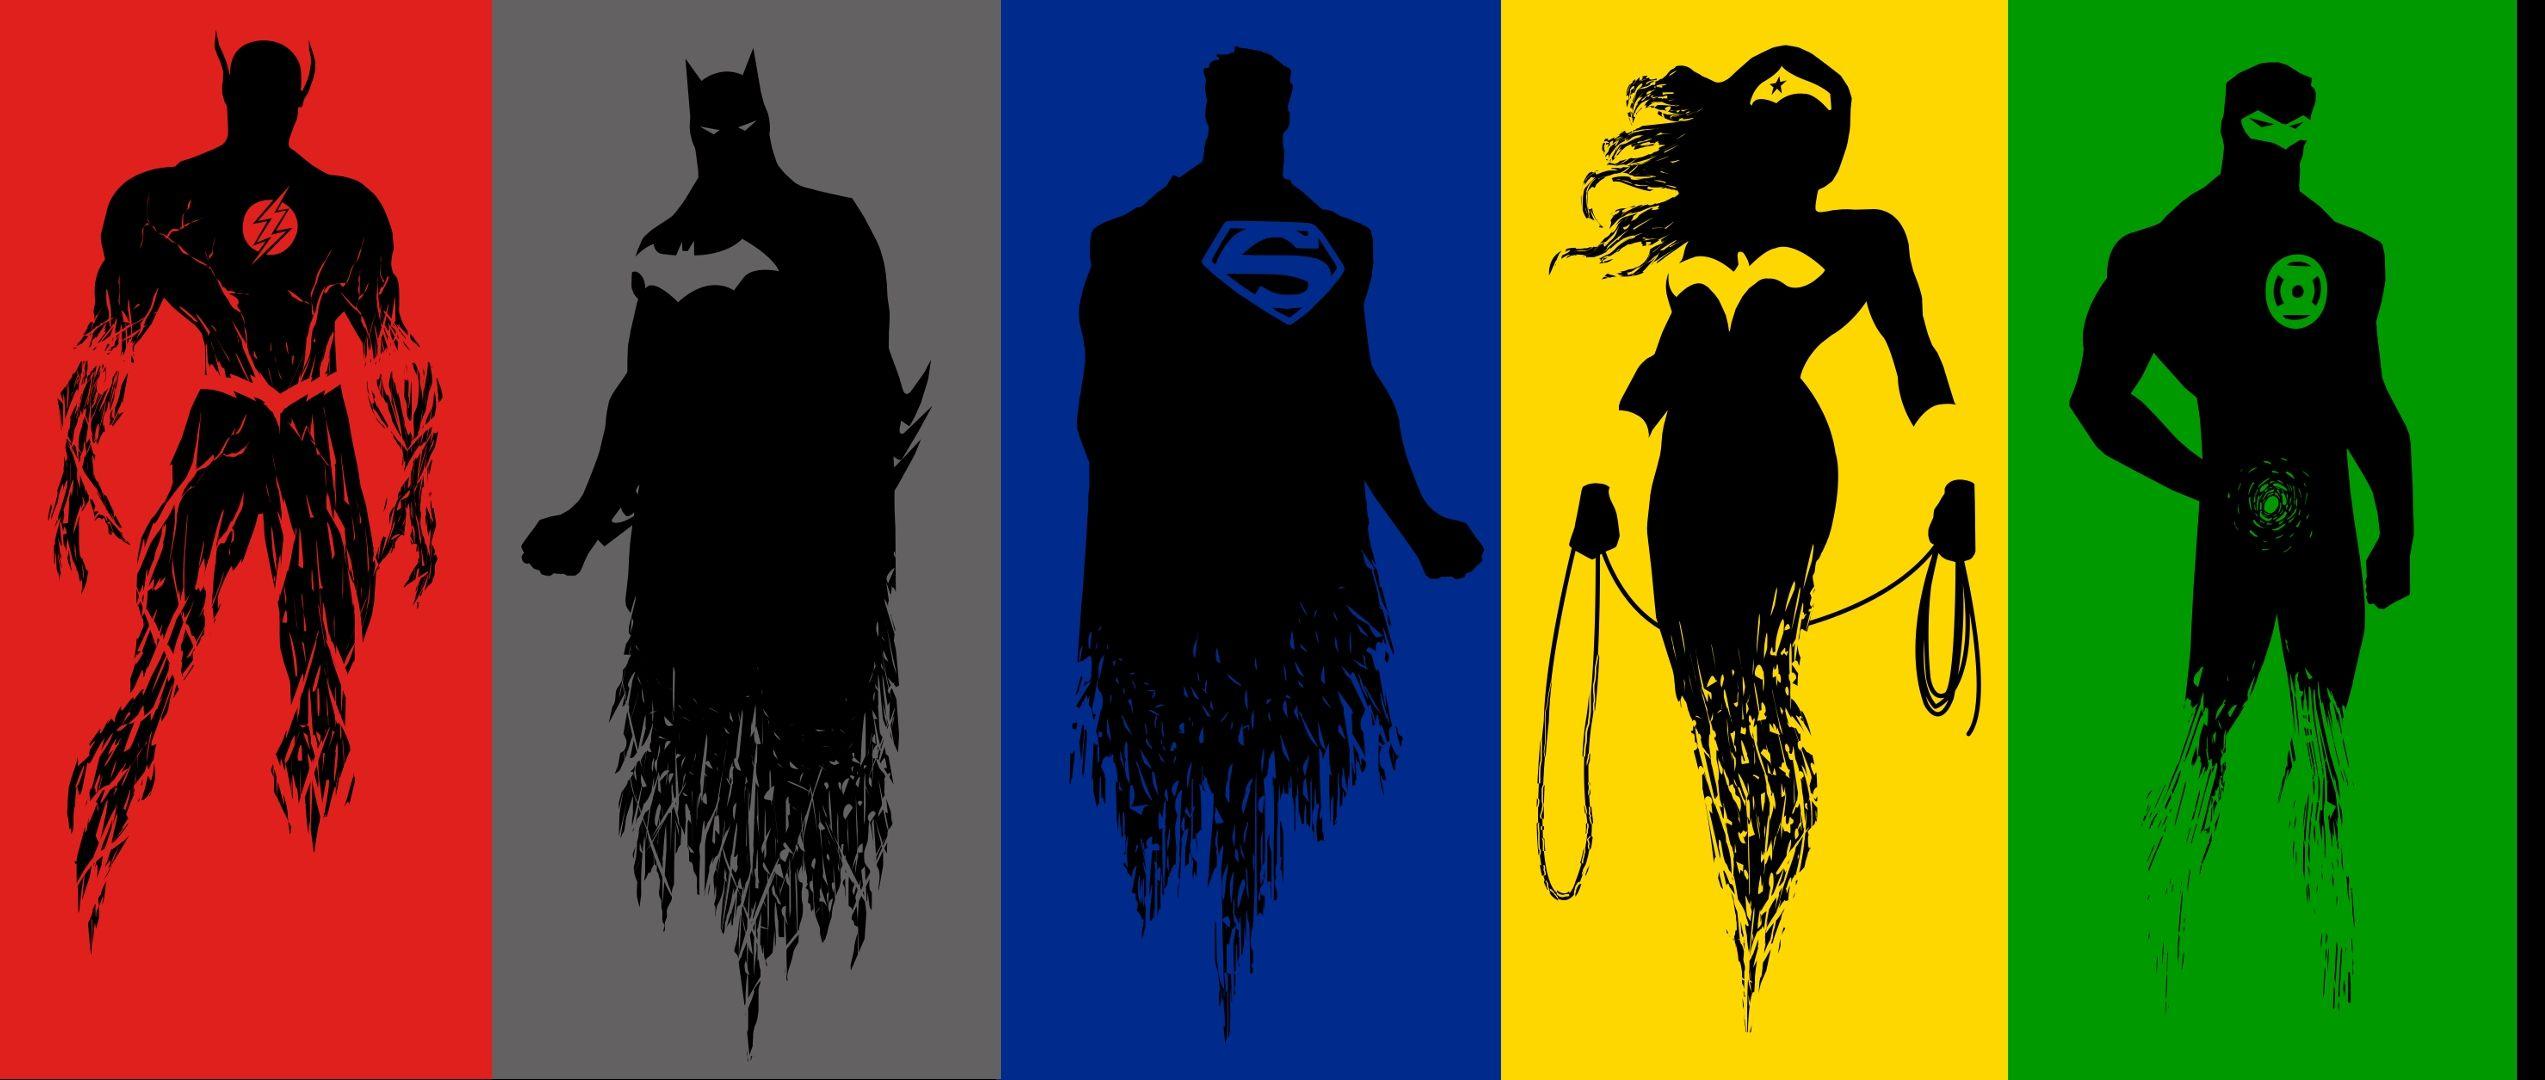 justice league computer wallpaper